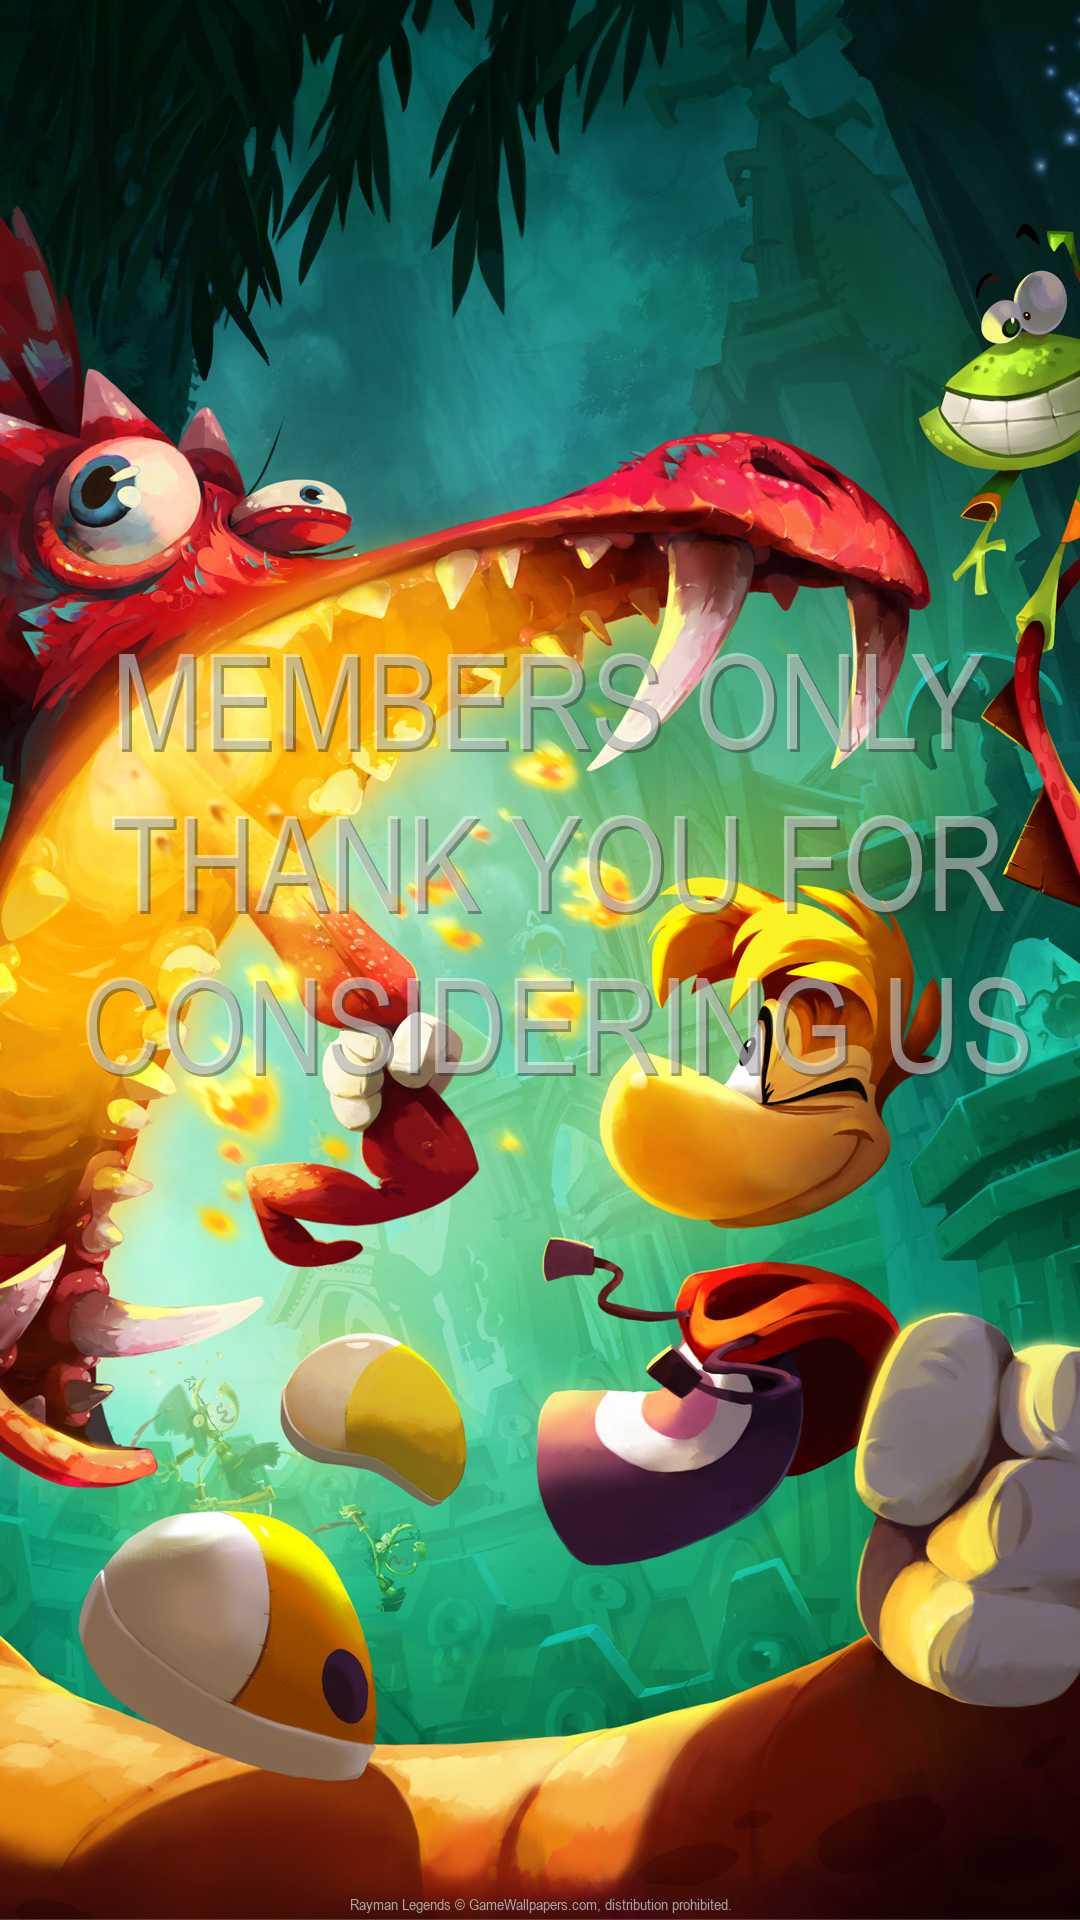 Rayman Legends 1080p Vertical Mobile wallpaper or background 03